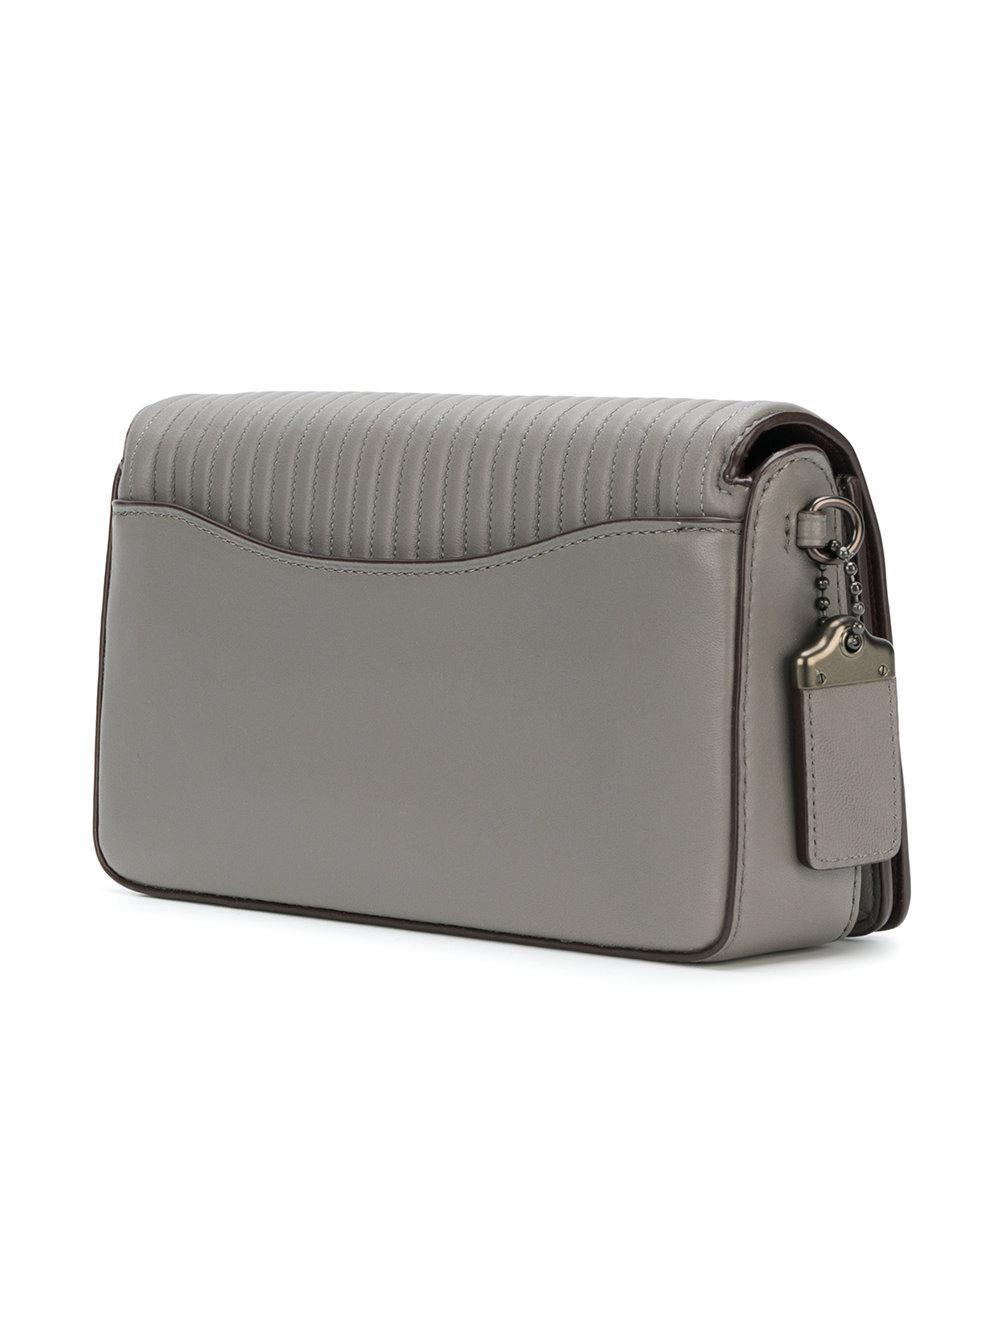 COACH Leather Dinky Crossbody Bag in Grey (Grey)